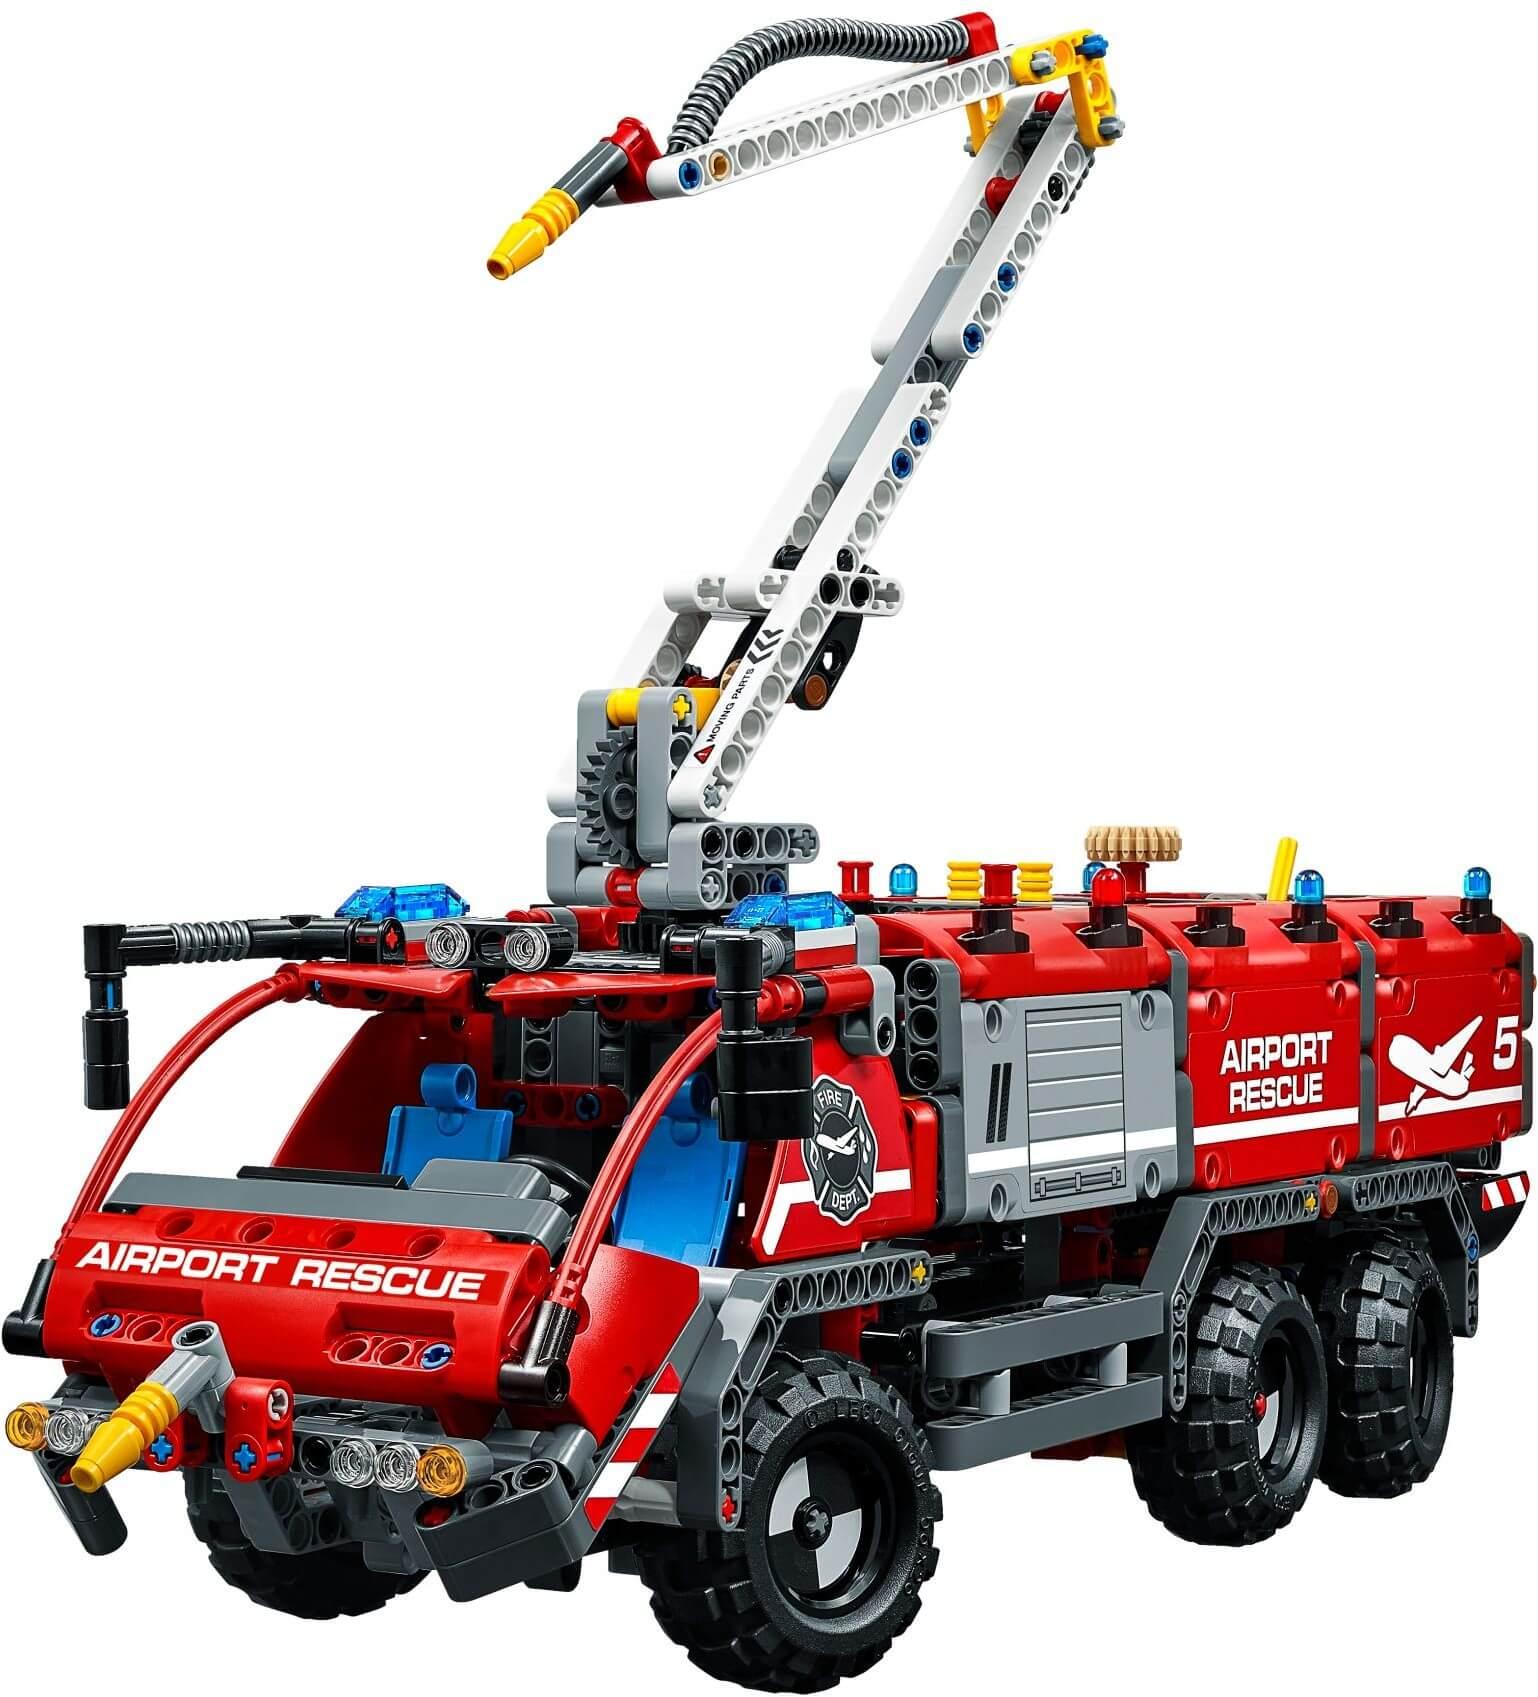 Mua đồ chơi LEGO 42068 - LEGO Technic 42068 - Xe Tải Cứu Hộ Sân Bay (LEGO Technic Airport Rescue Vehicle)